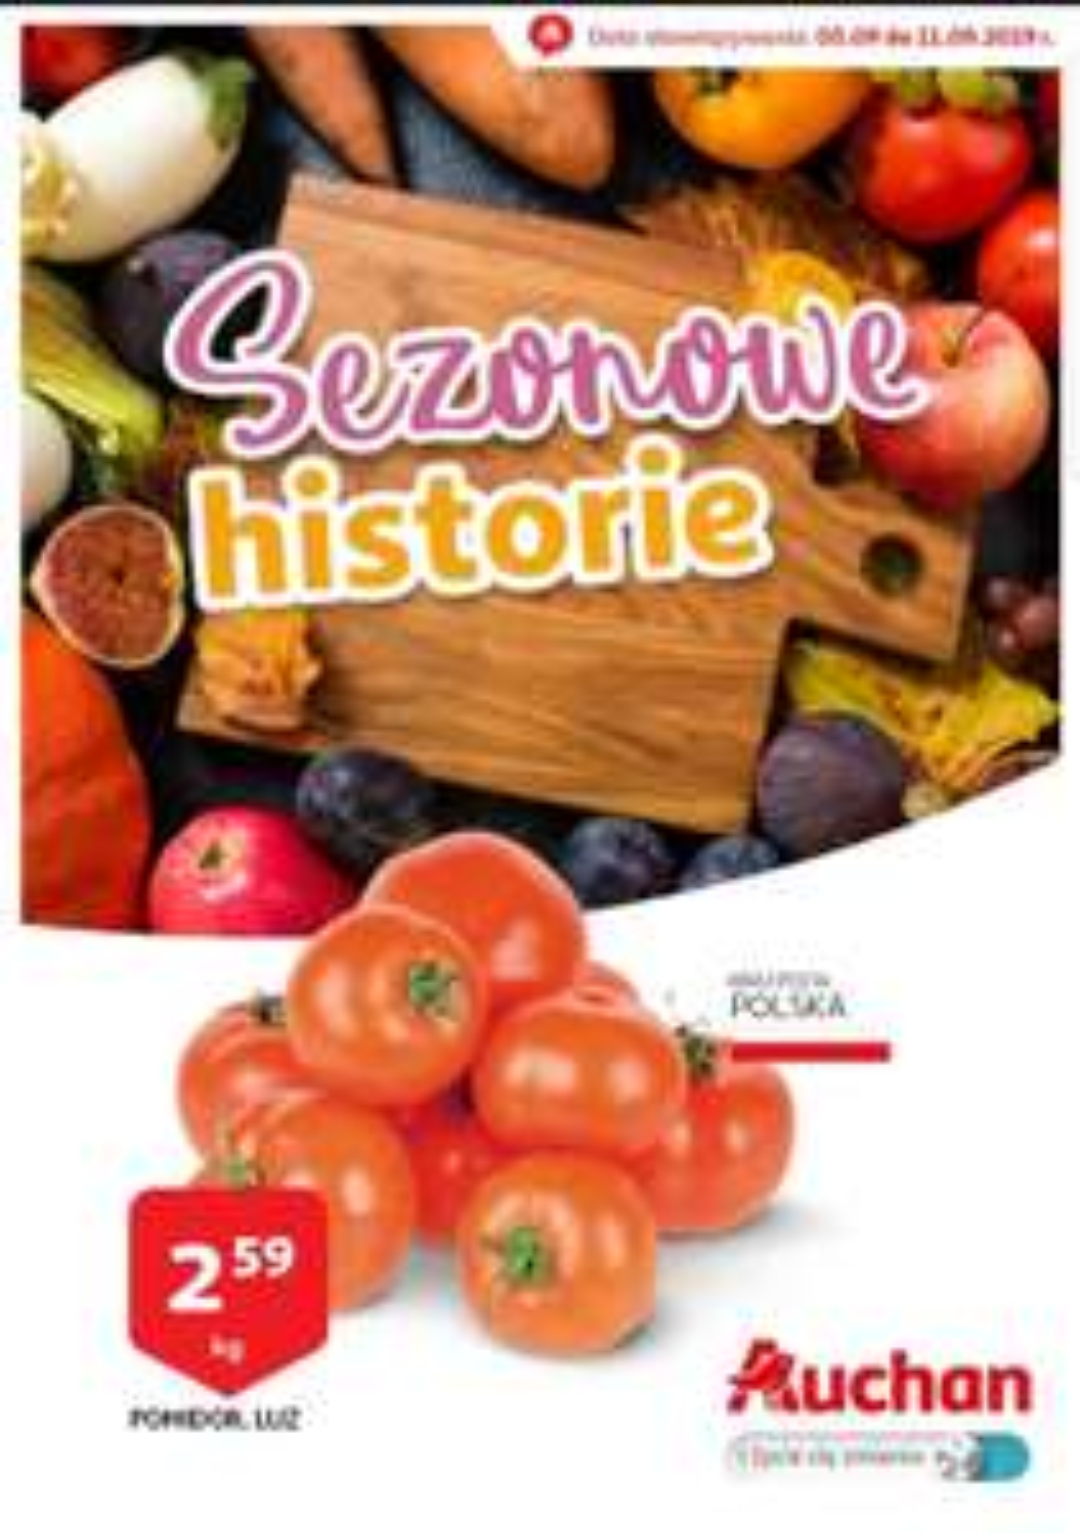 Pomidory 1kg/2.99 Auchan od 5.09 do 11.09